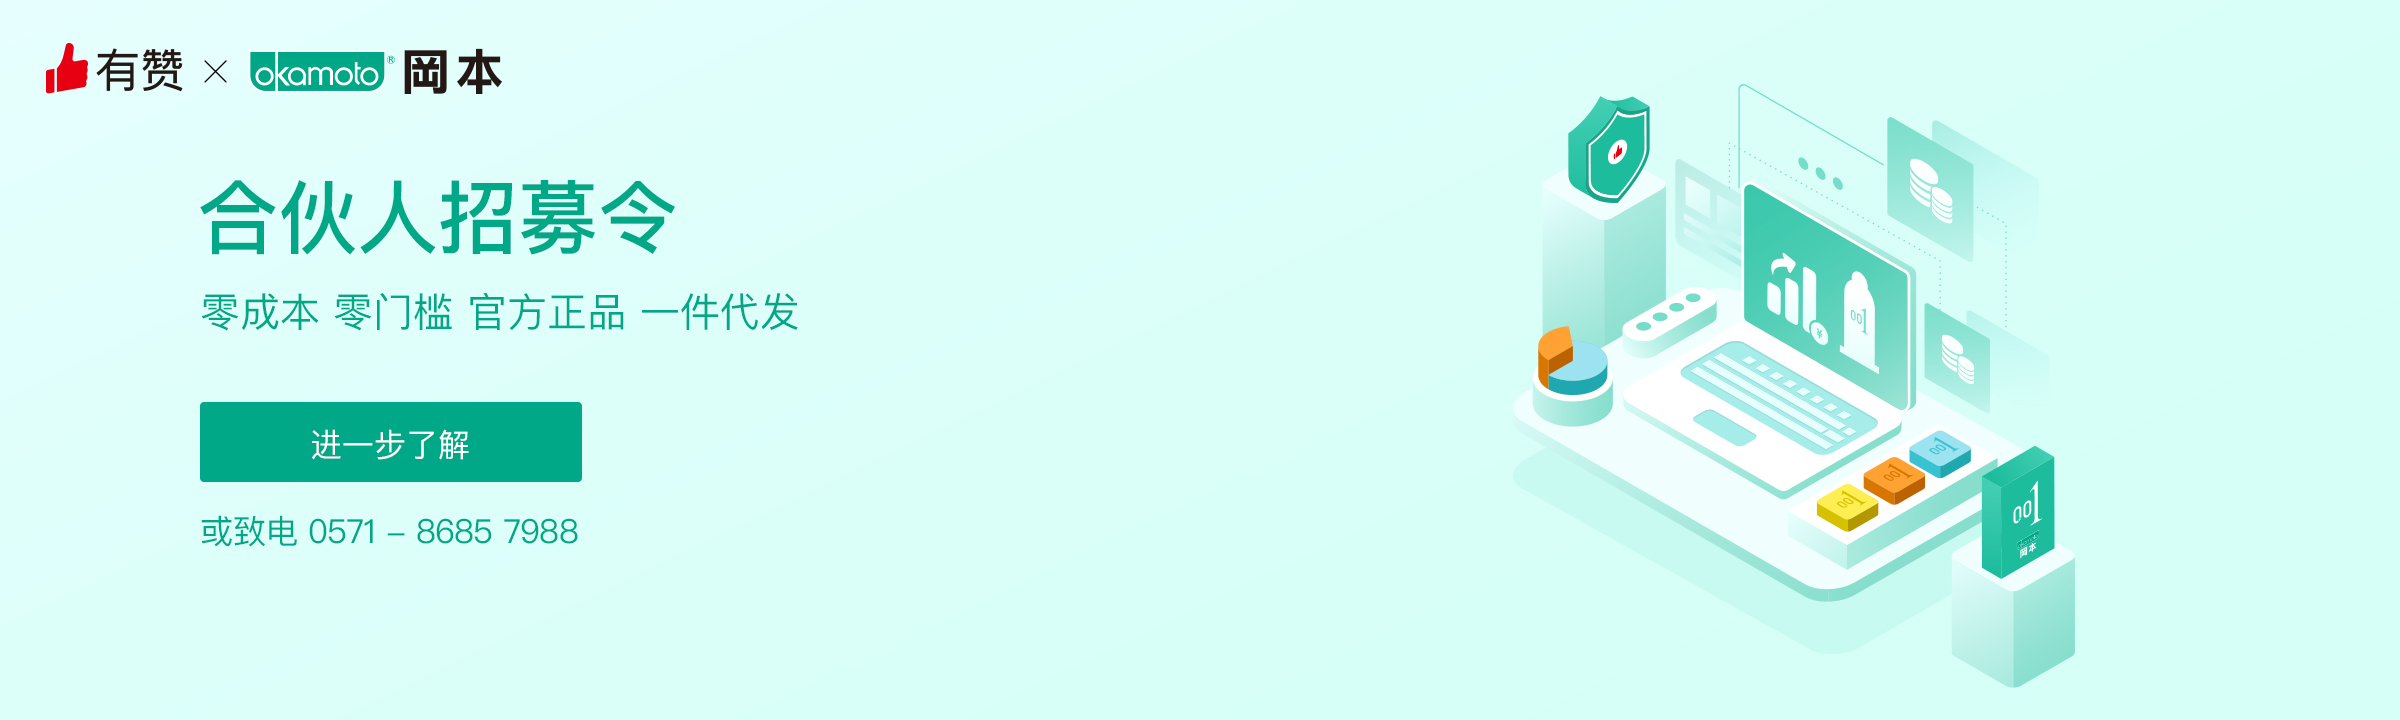 冈本_有赞官网banner.jpg